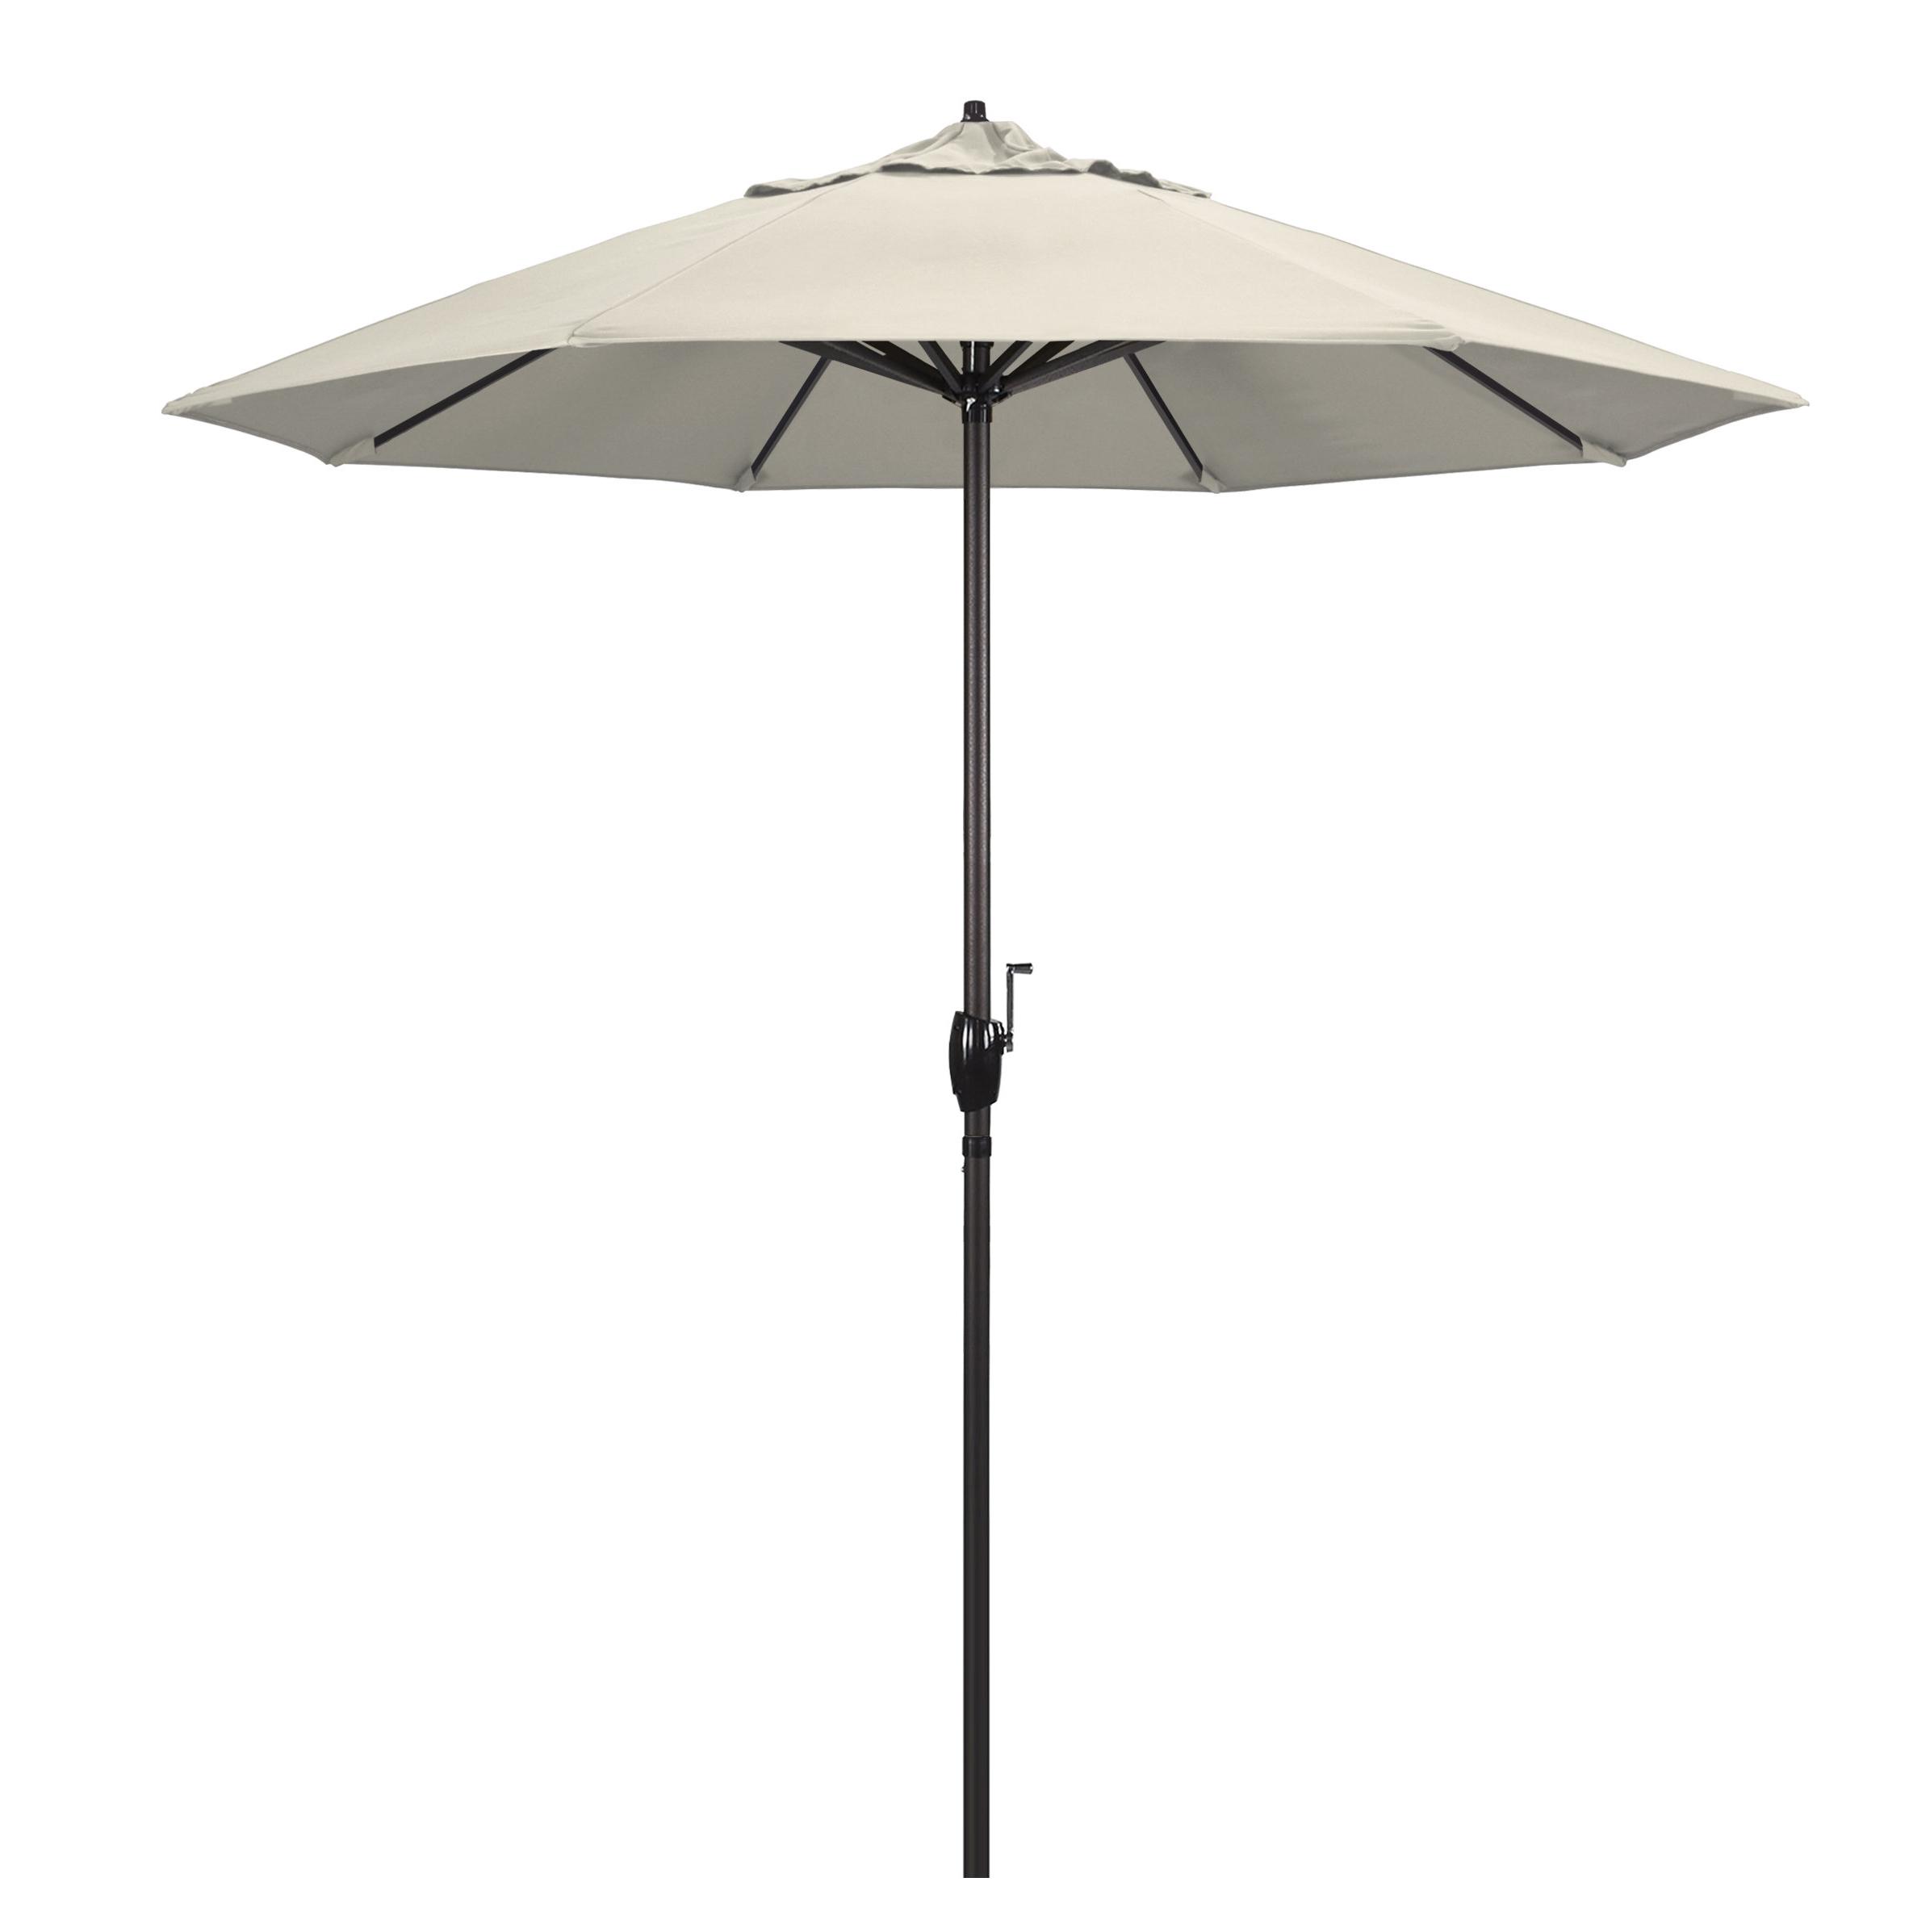 Canora Grey Nunn 8' Market Sunbrella Umbrella Within Most Popular Wiebe Auto Tilt Square Market Sunbrella Umbrellas (View 16 of 20)